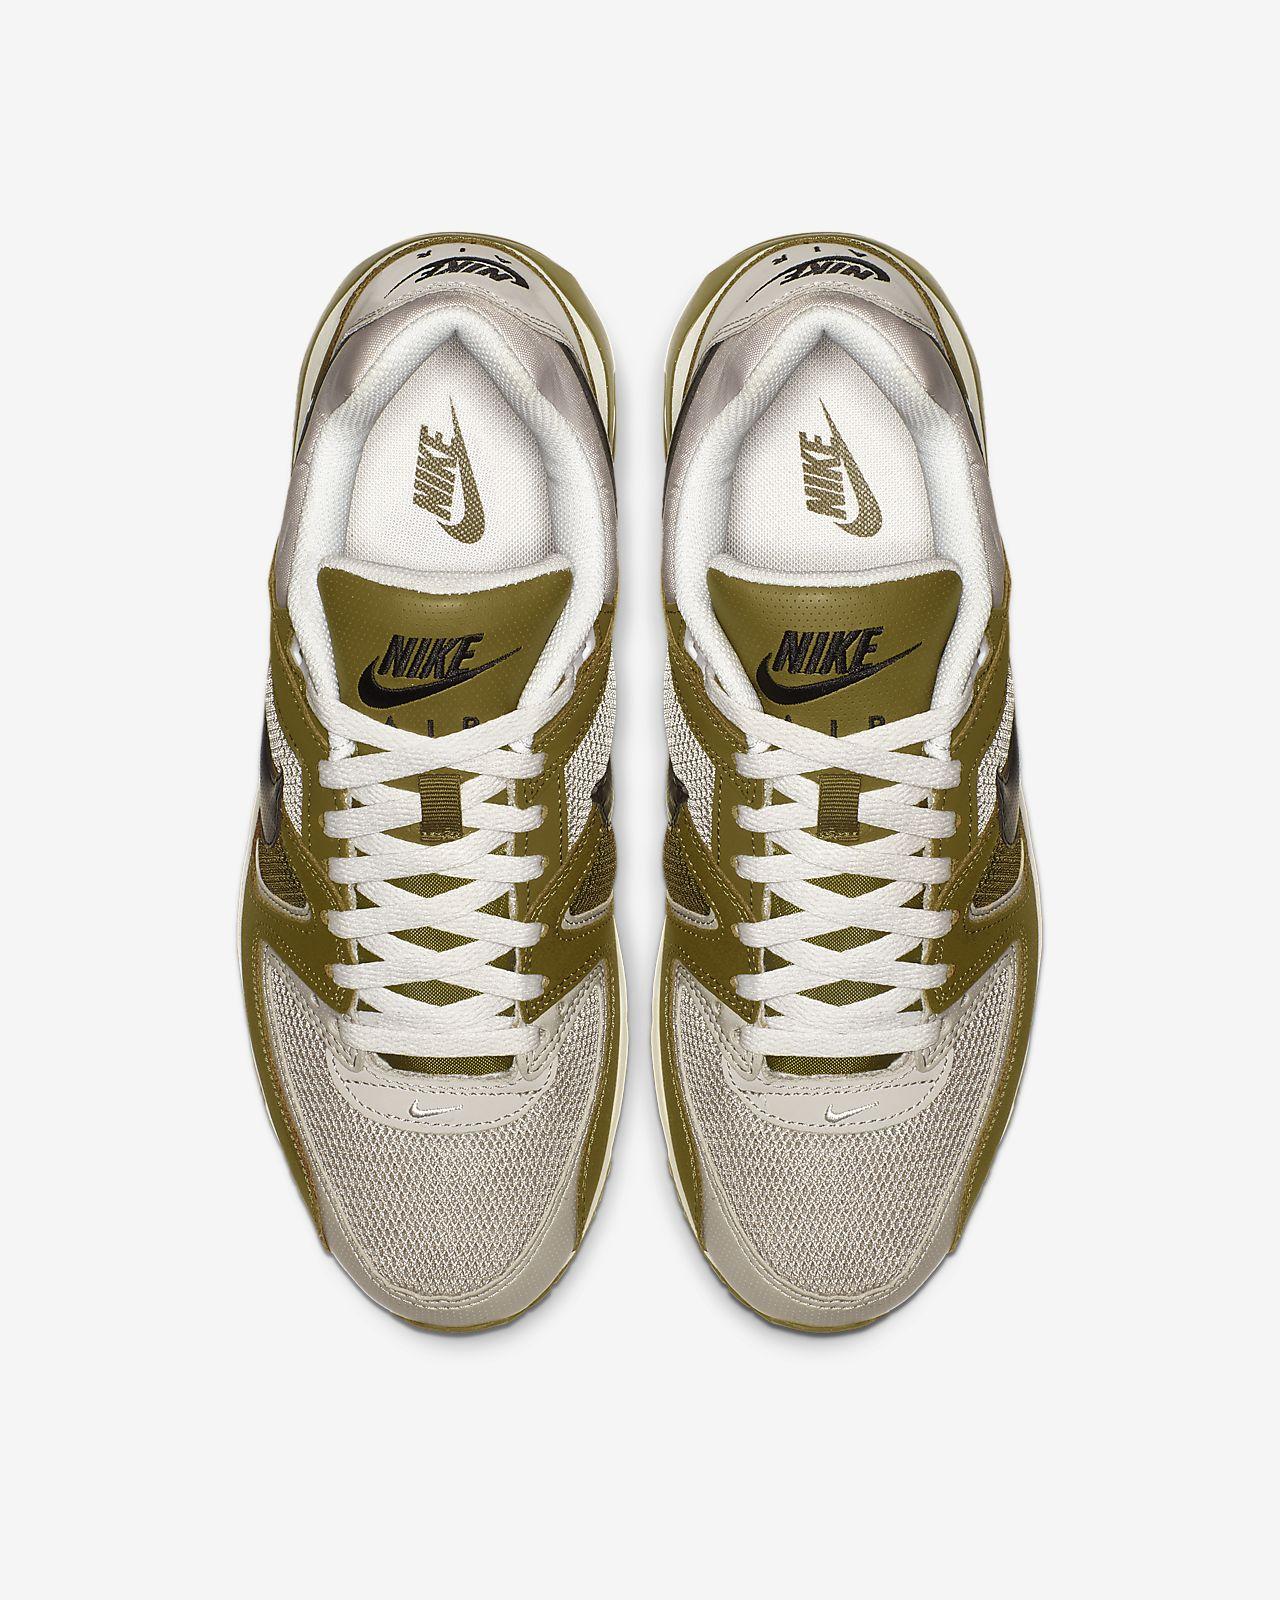 Nike Air Max Command Herrenschuh. Nike DE Stilvoll und